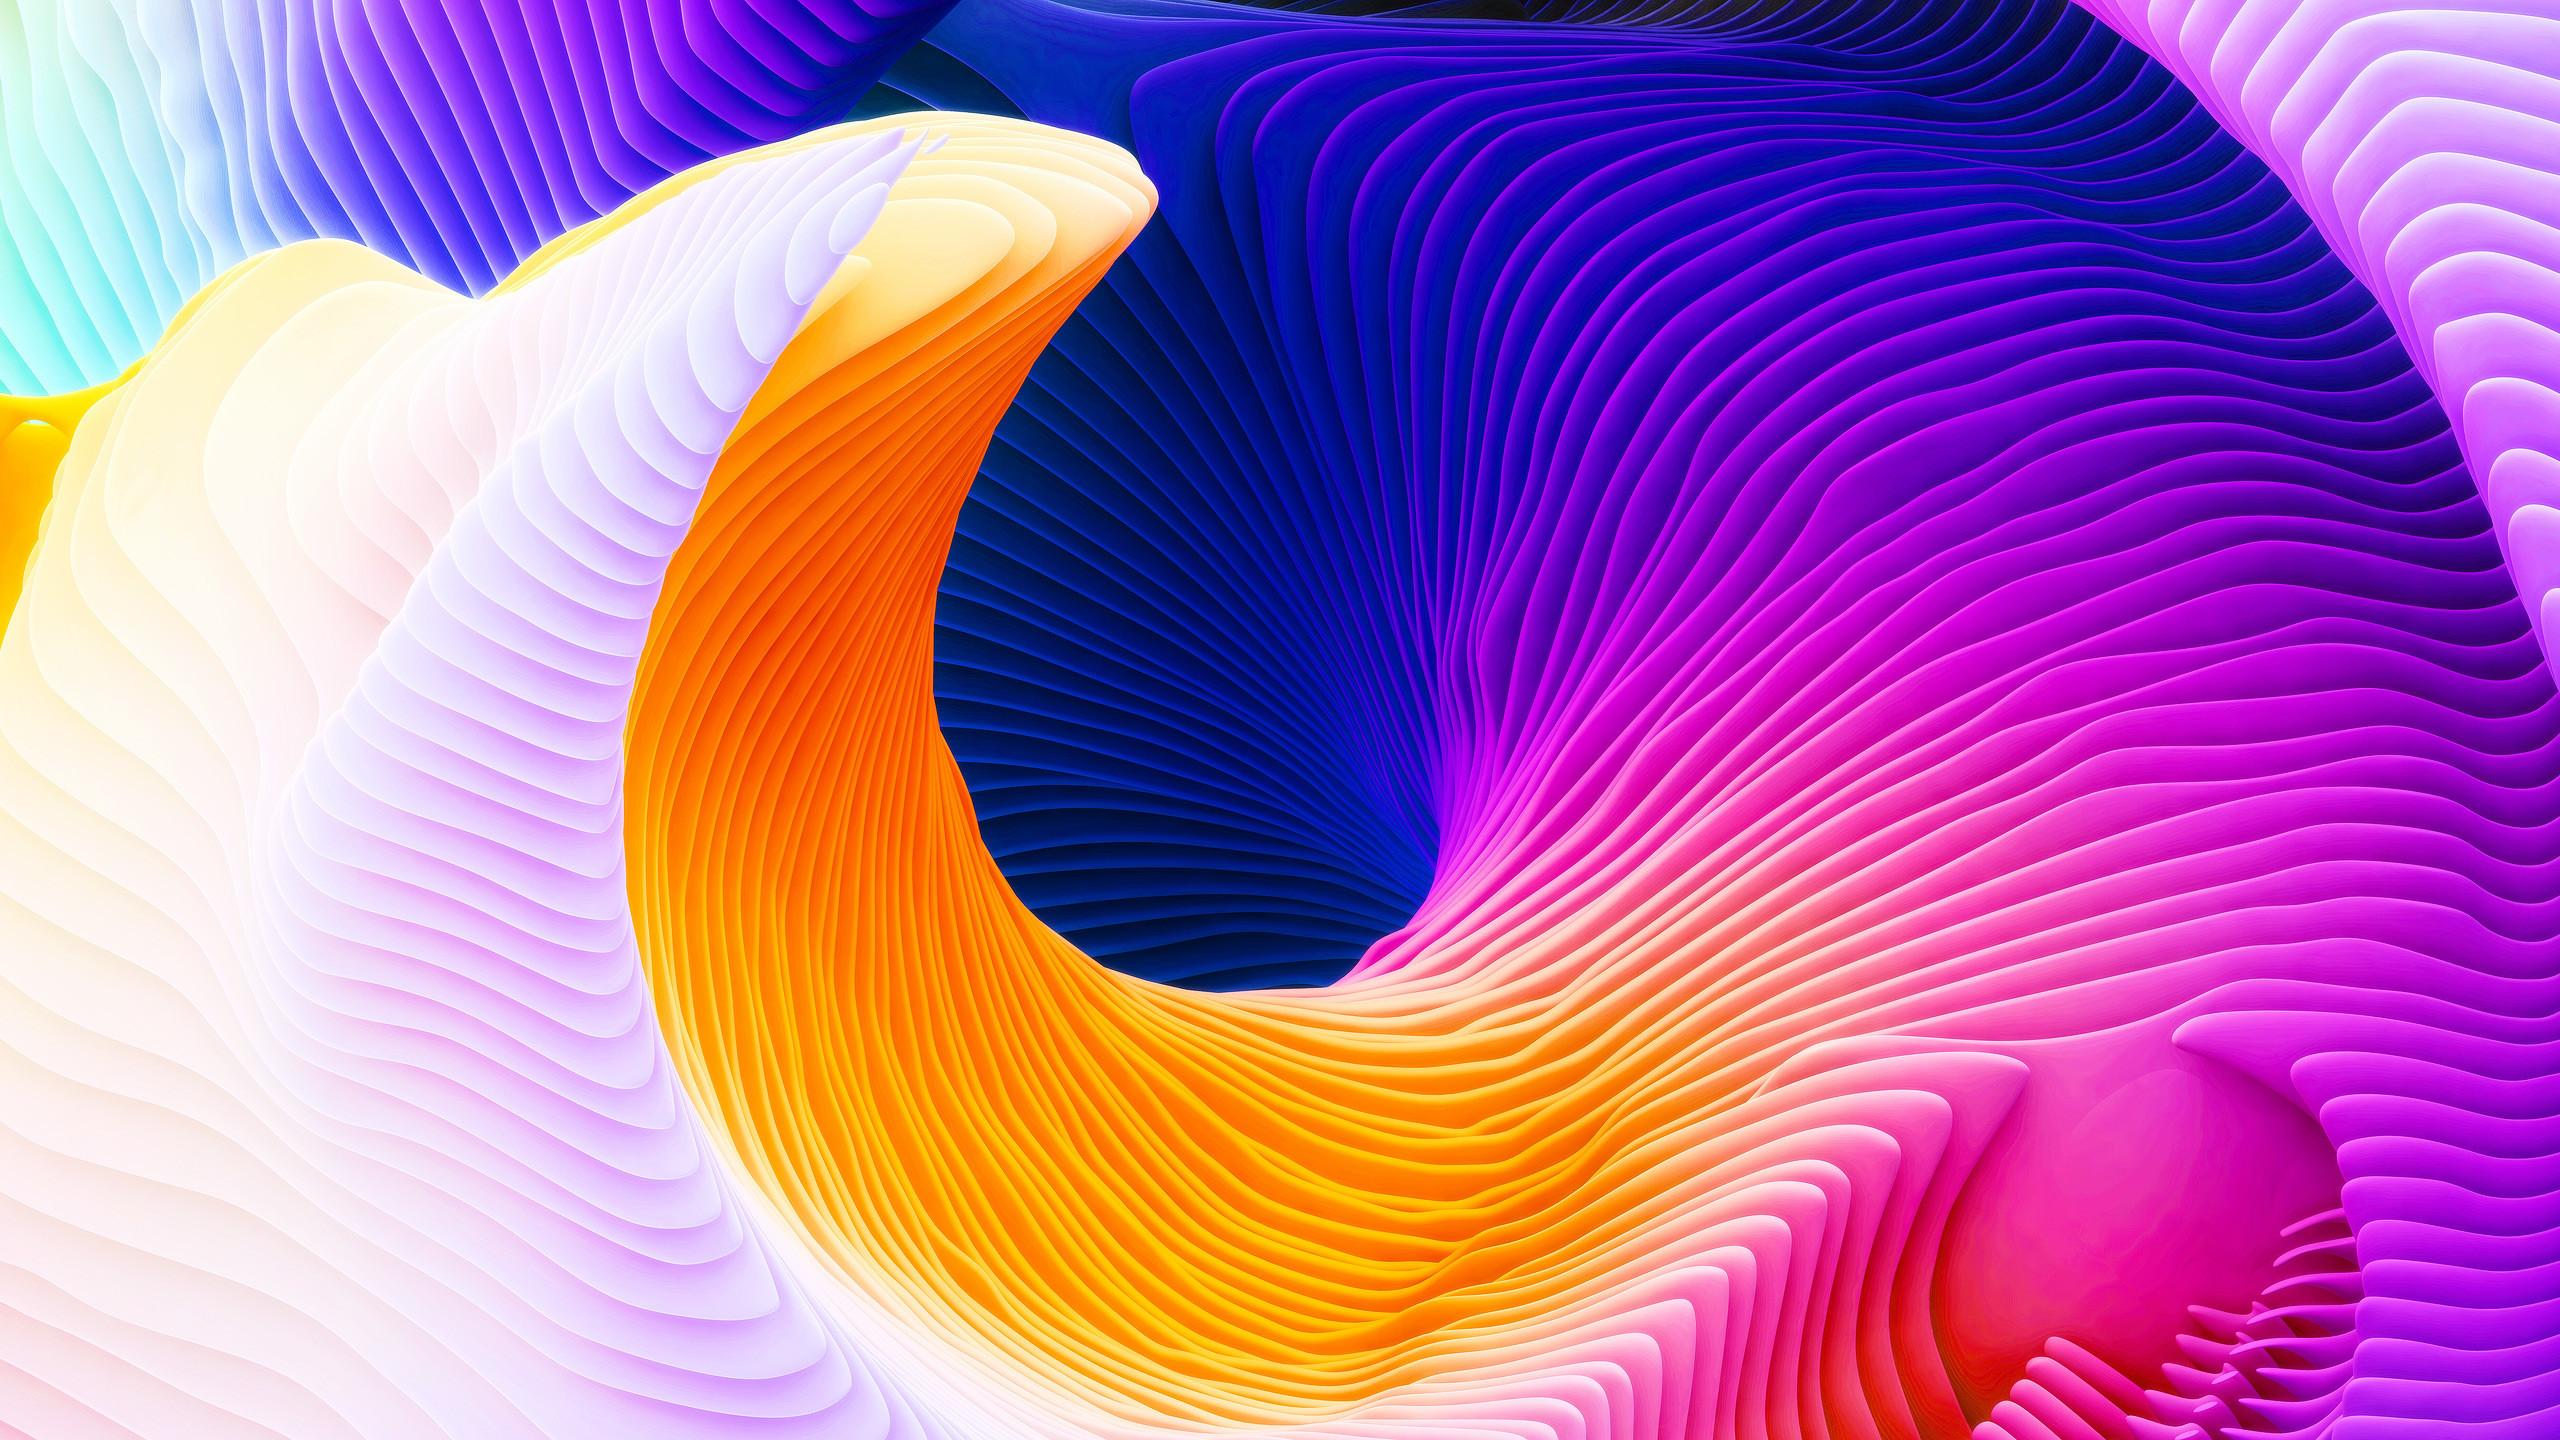 Abstract / Spiral Wallpaper. Spiral, Yellow, Purple, HD